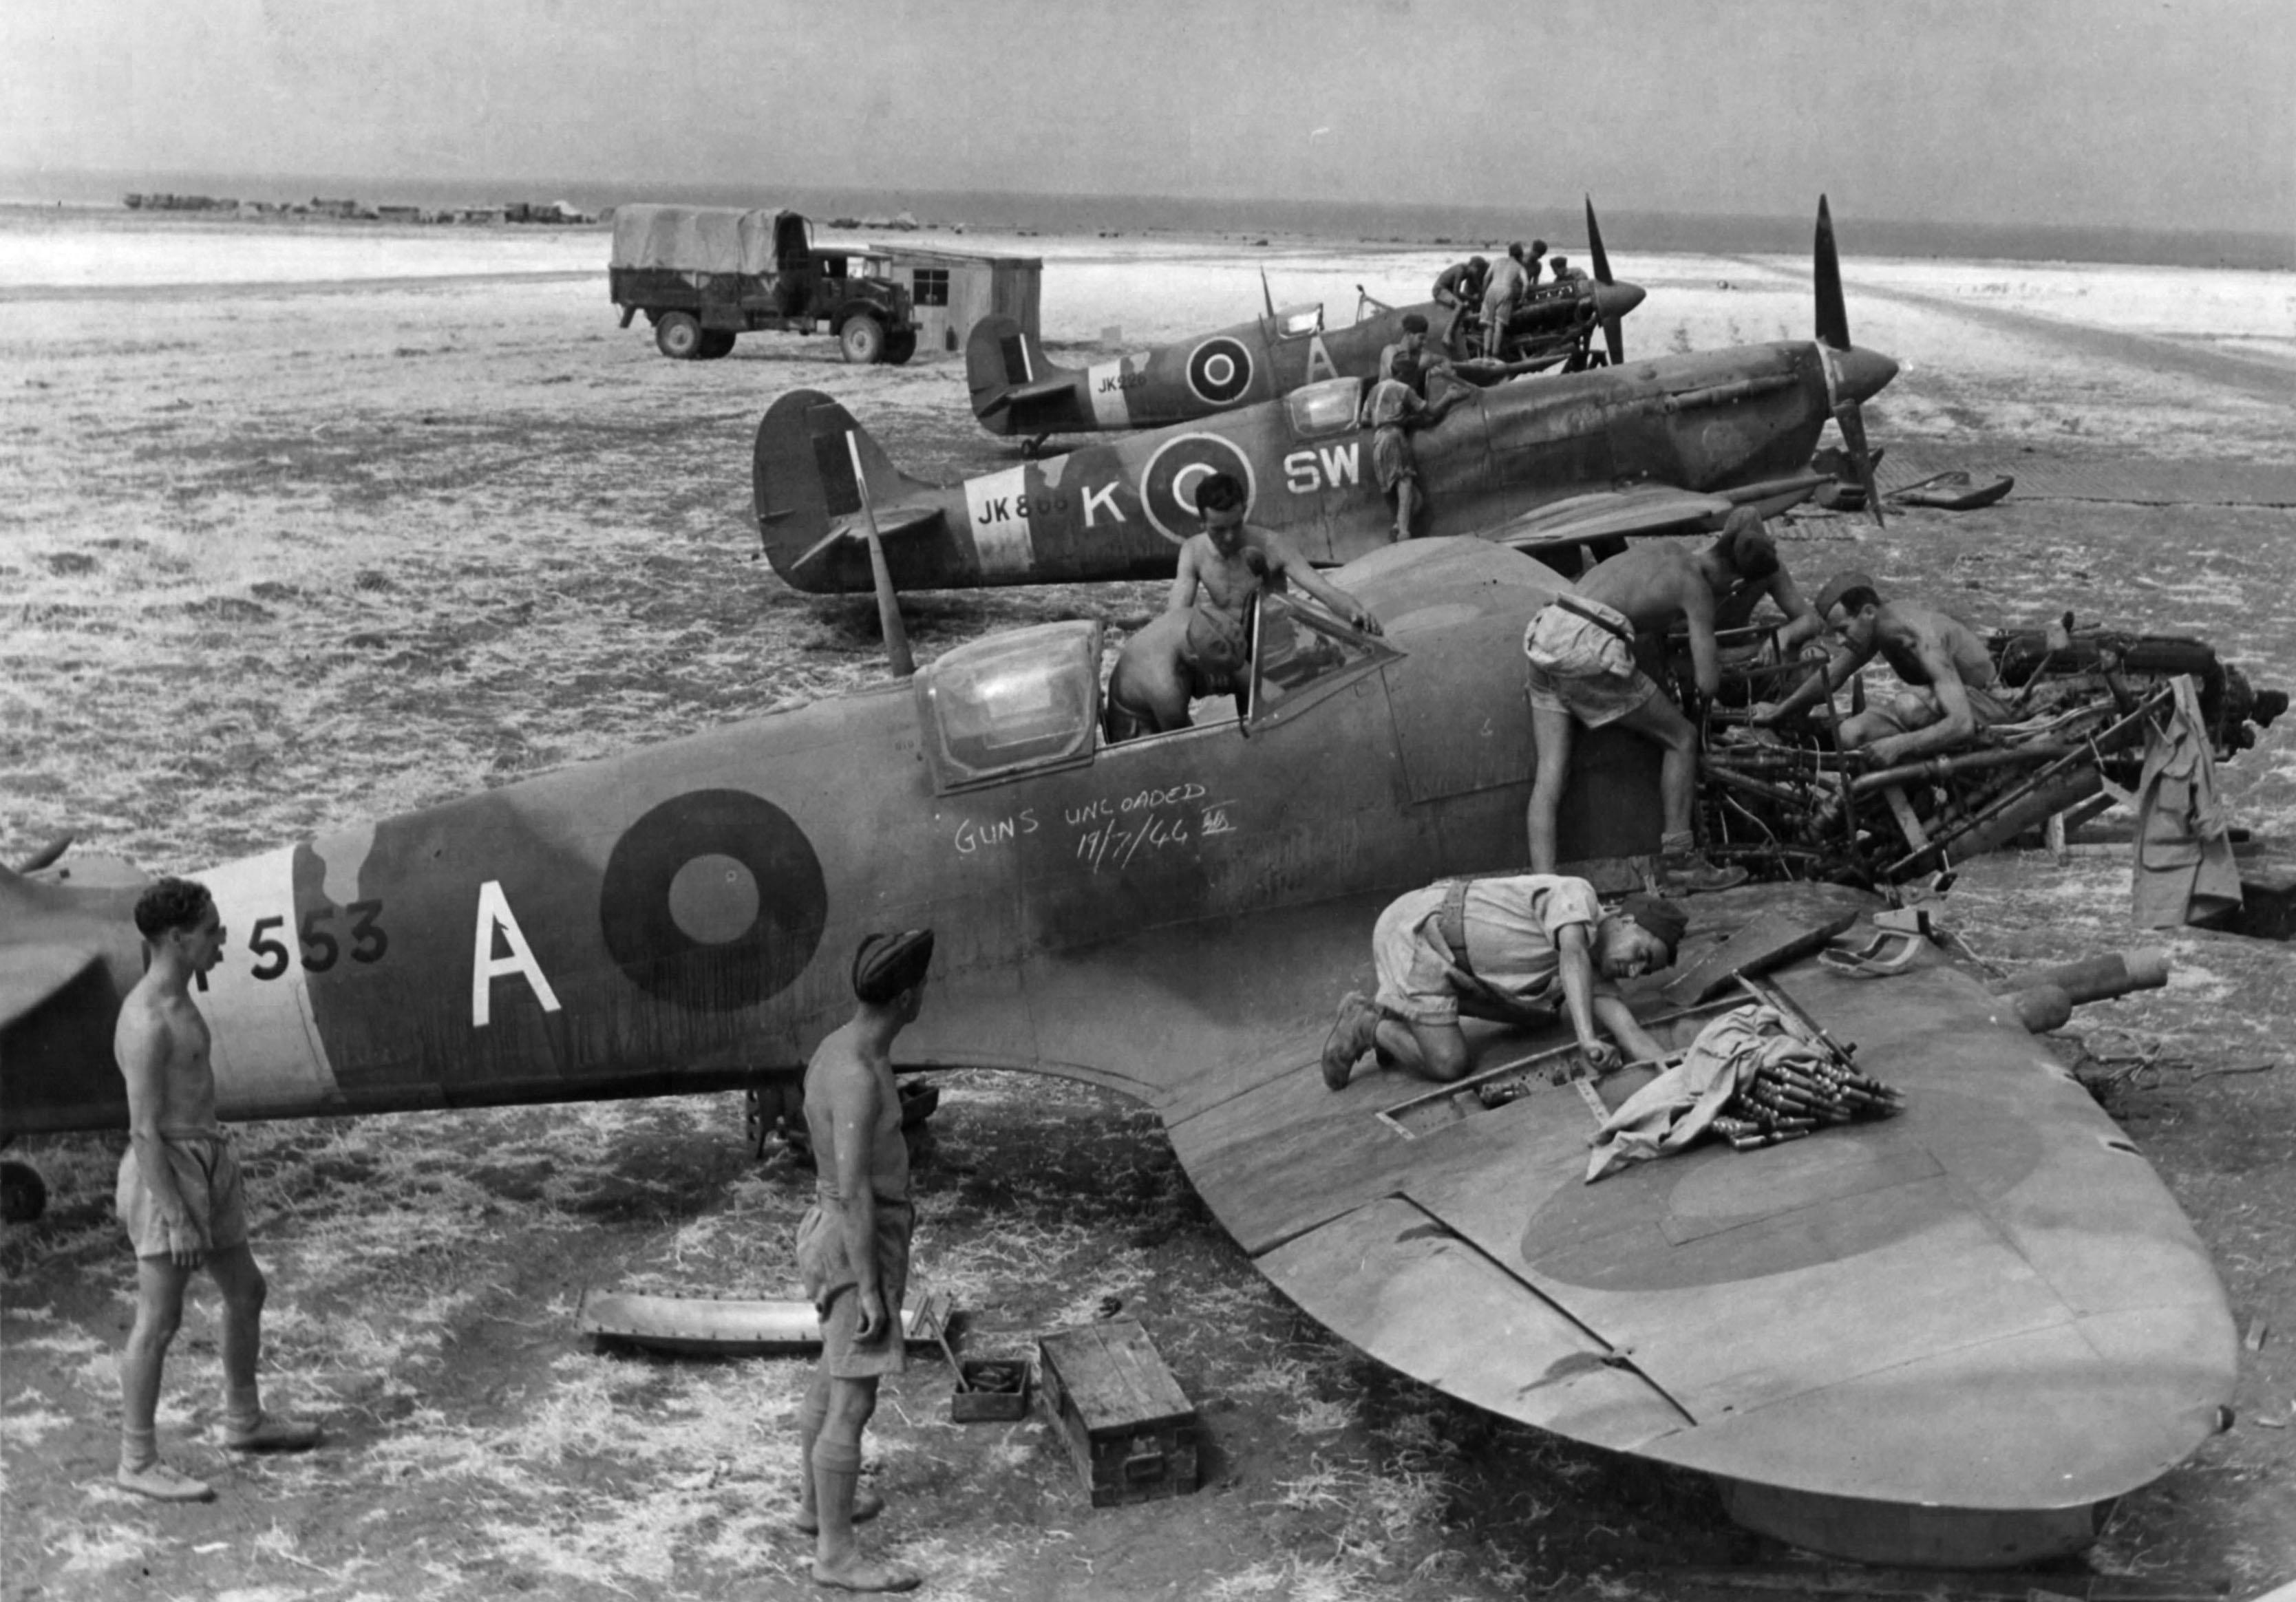 Spitfire MkVcTrop RAF 253Sqn SWK undergoing repairs JK868 Italy July 19 1944 02